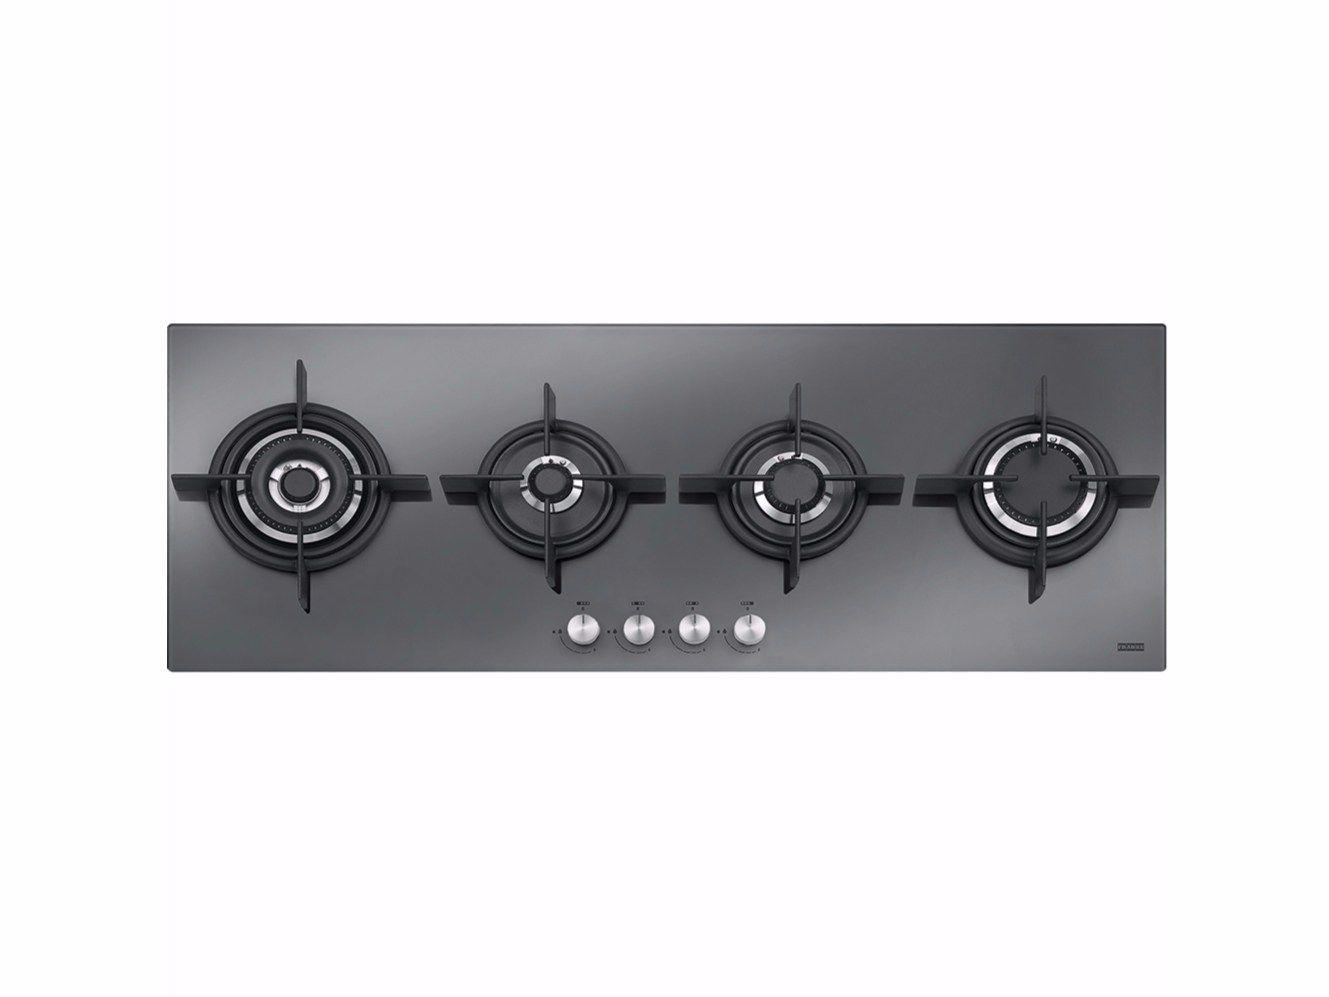 Piani cottura | Elettrodomestici da cucina | Archiproducts